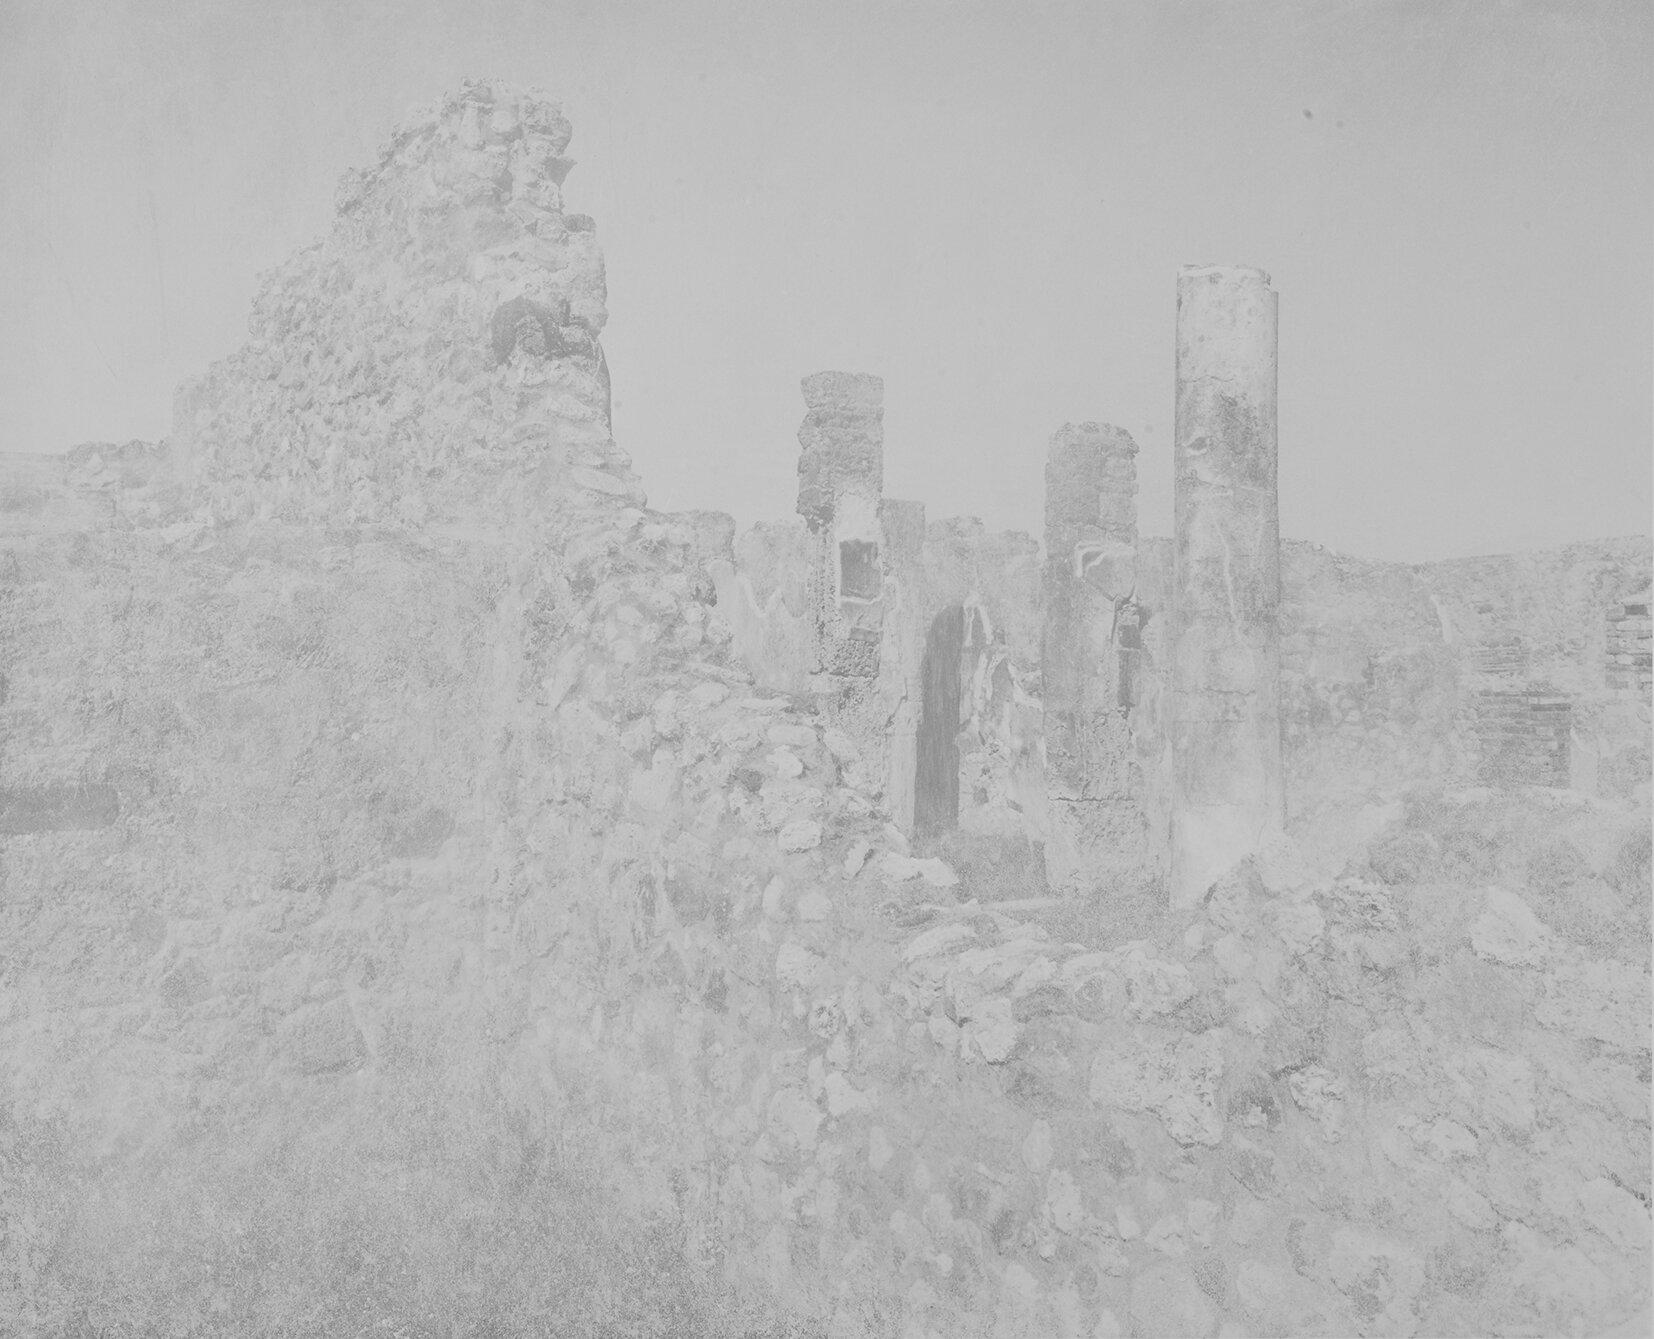 Pompeii_walls_02_courtesyGalerieThierrBigaignon.jpg